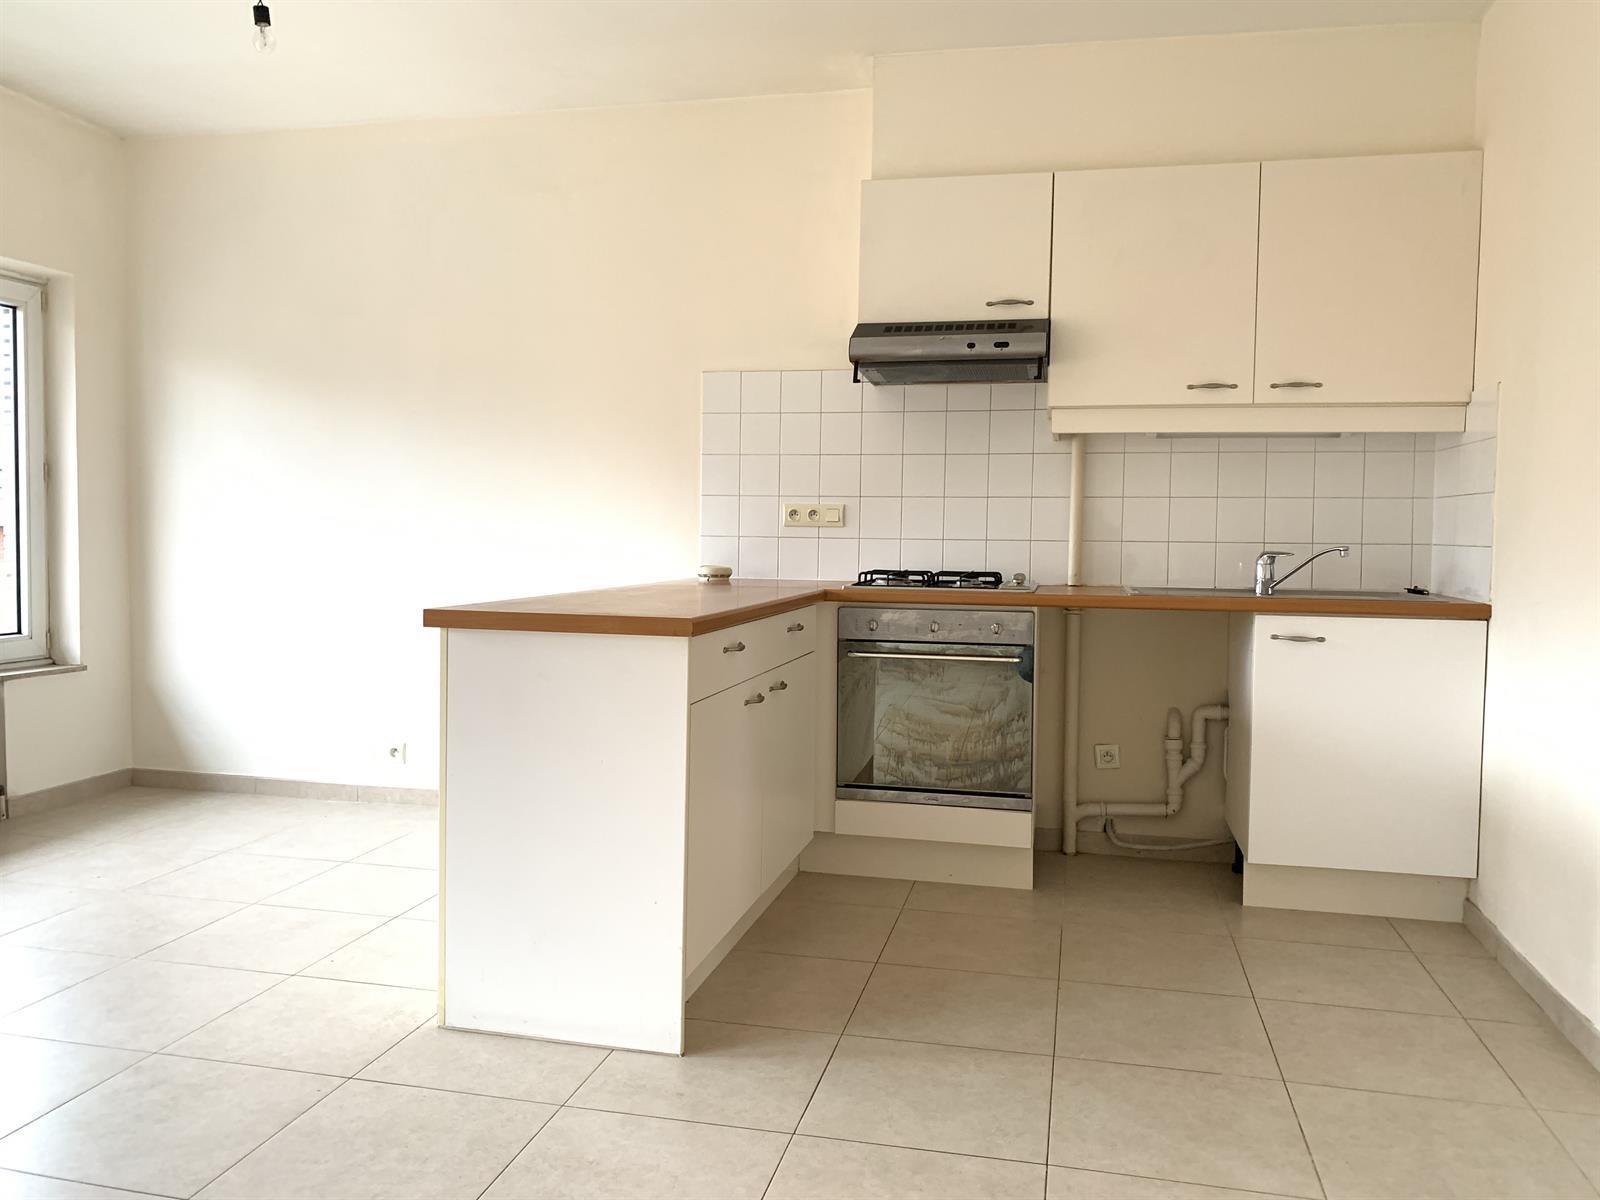 Appartement - Ganshoren - #3973643-3